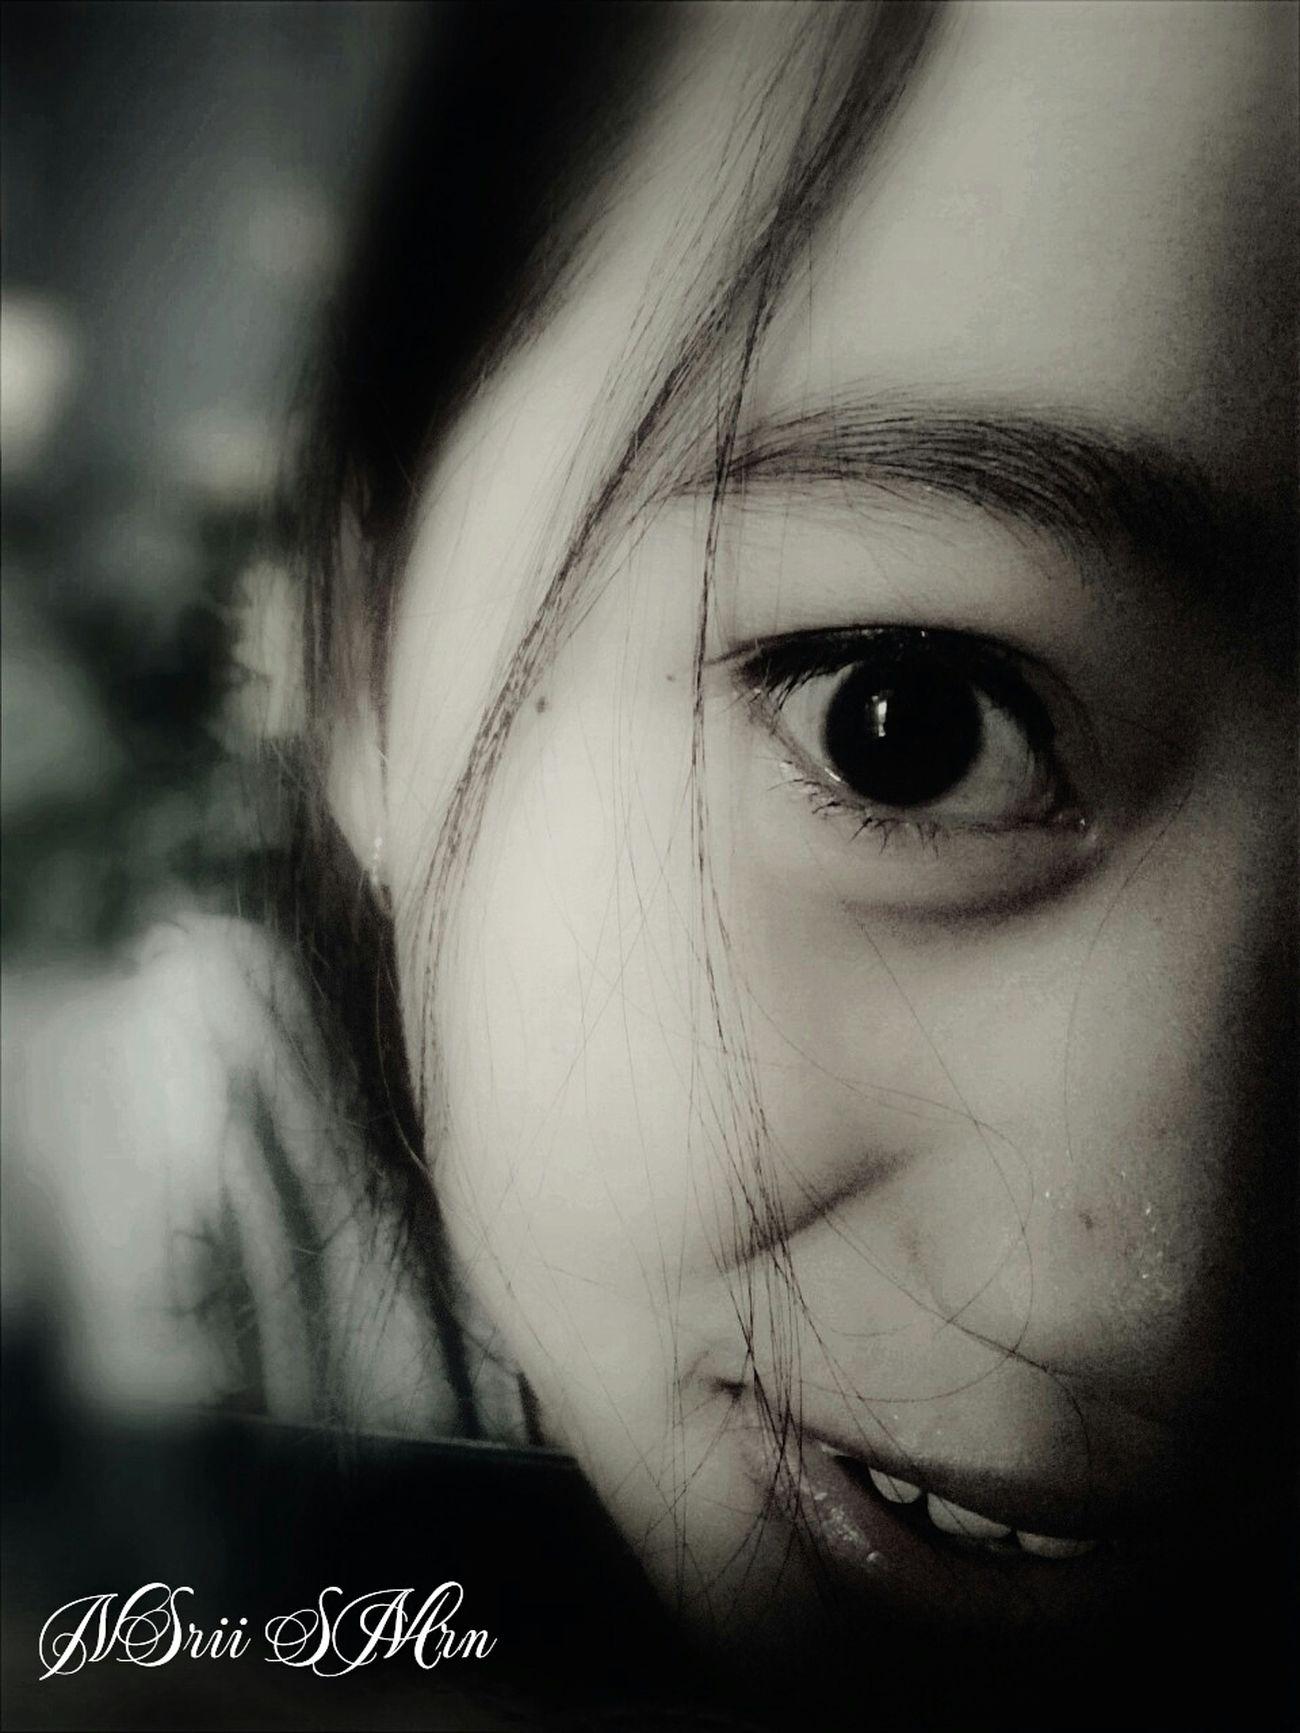 Grils Eyes Face Happy Blackandwhite Followme Thanksforfollowing Thanksforlike Nsrii_smrn